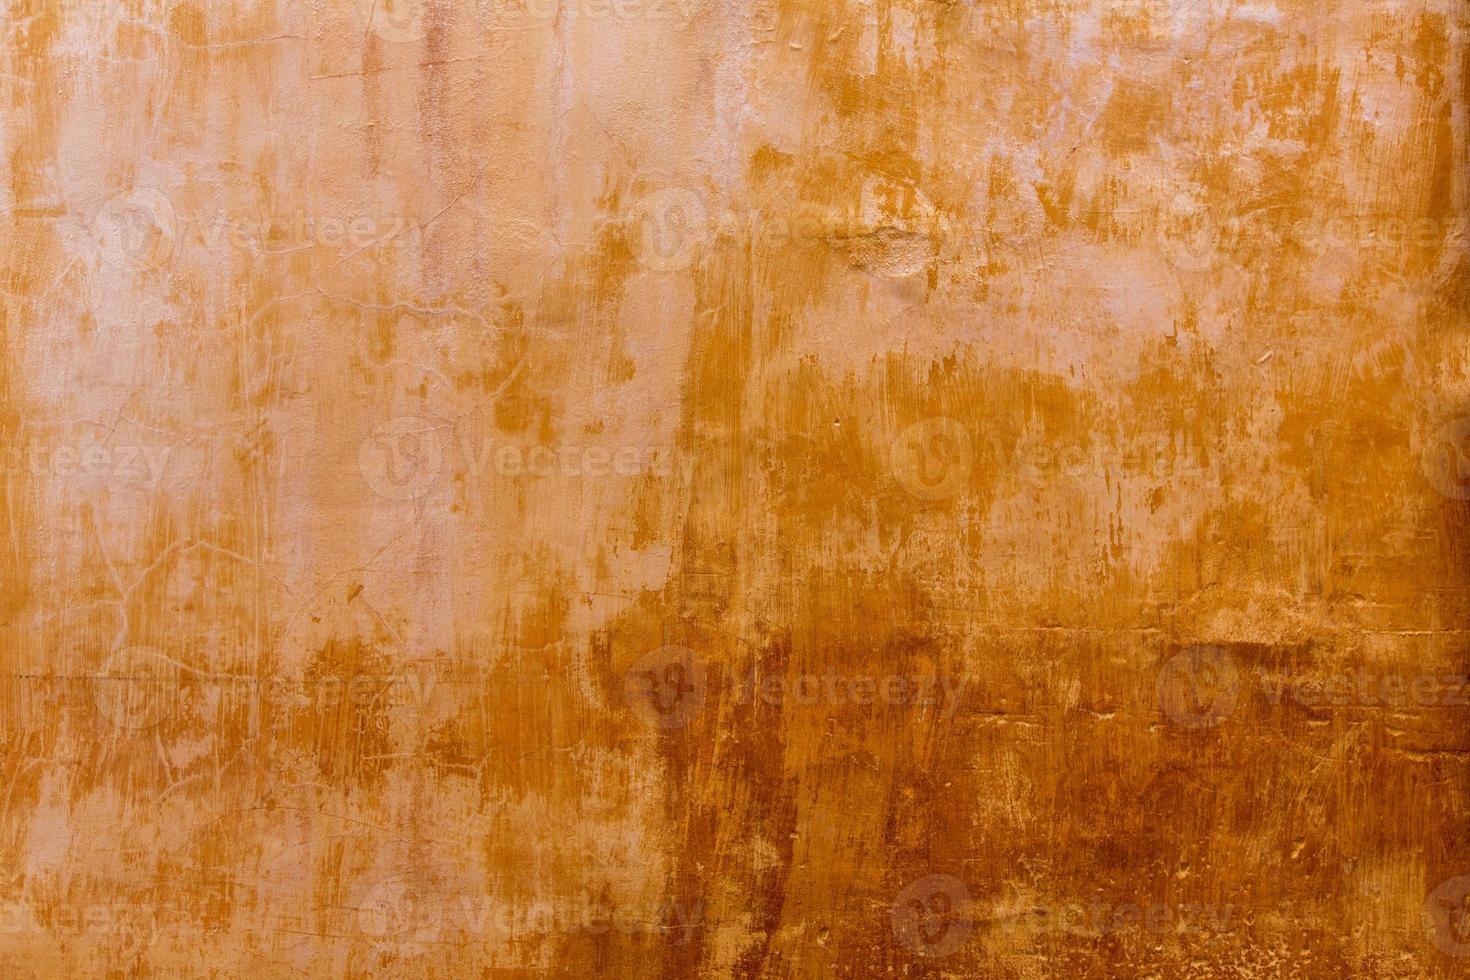 menorca ciutadella golden grunge ocre fachada textura foto